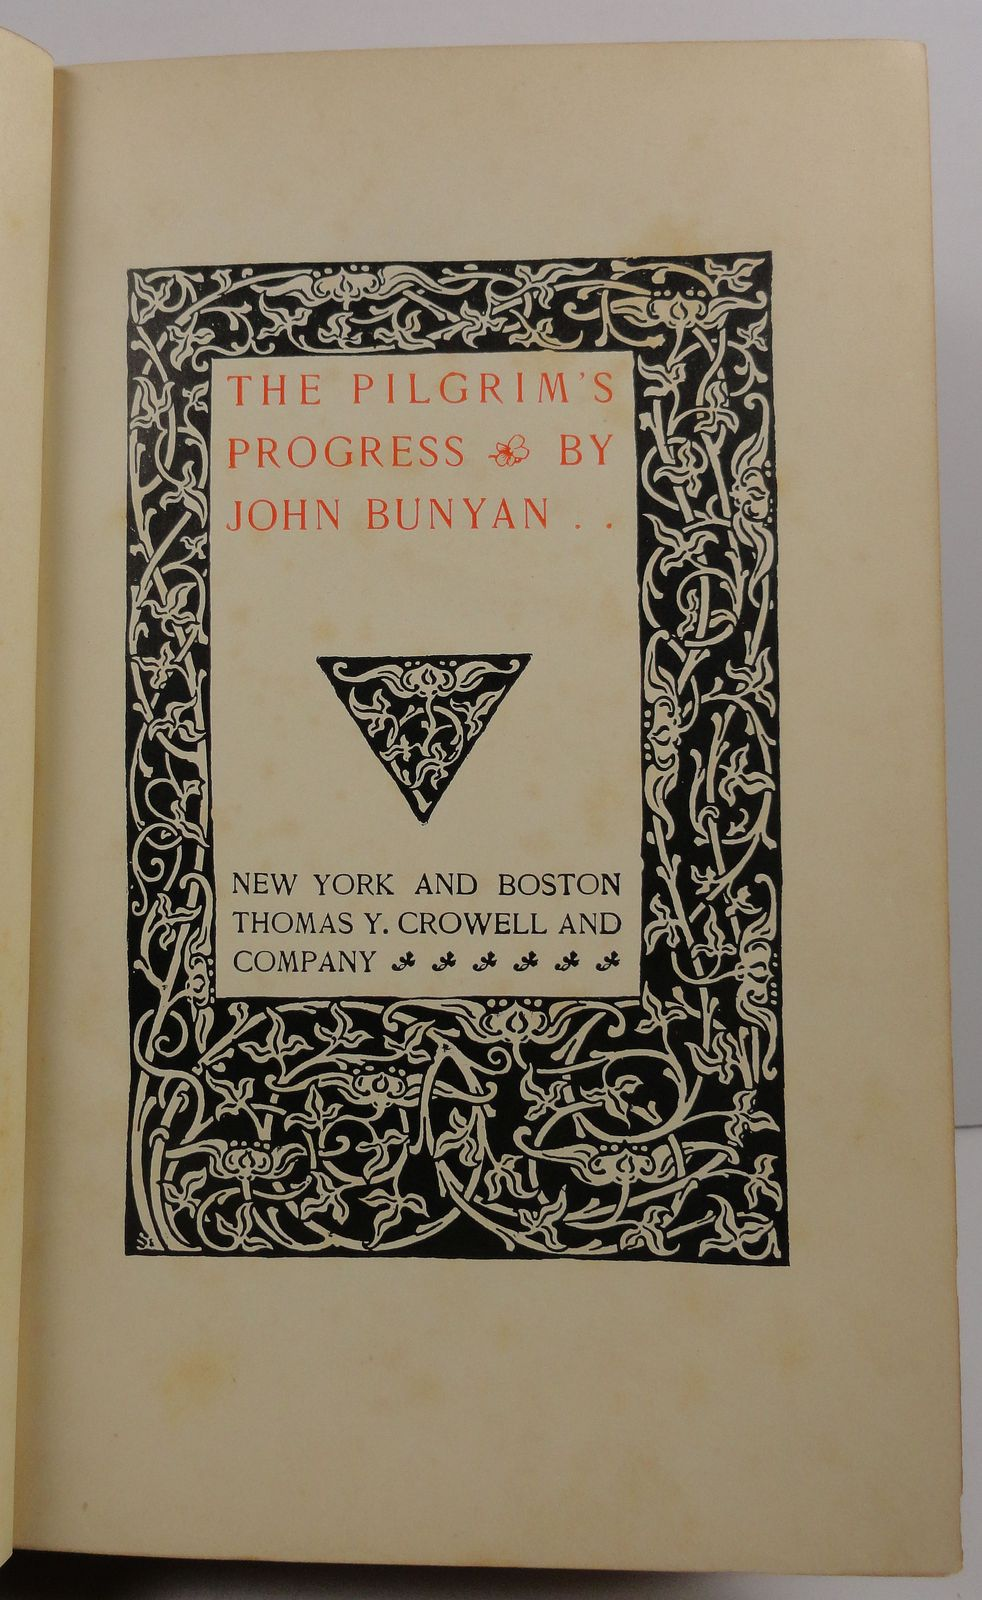 The Pilgrim's Progress by John Bunyan Thomas Y Crowell